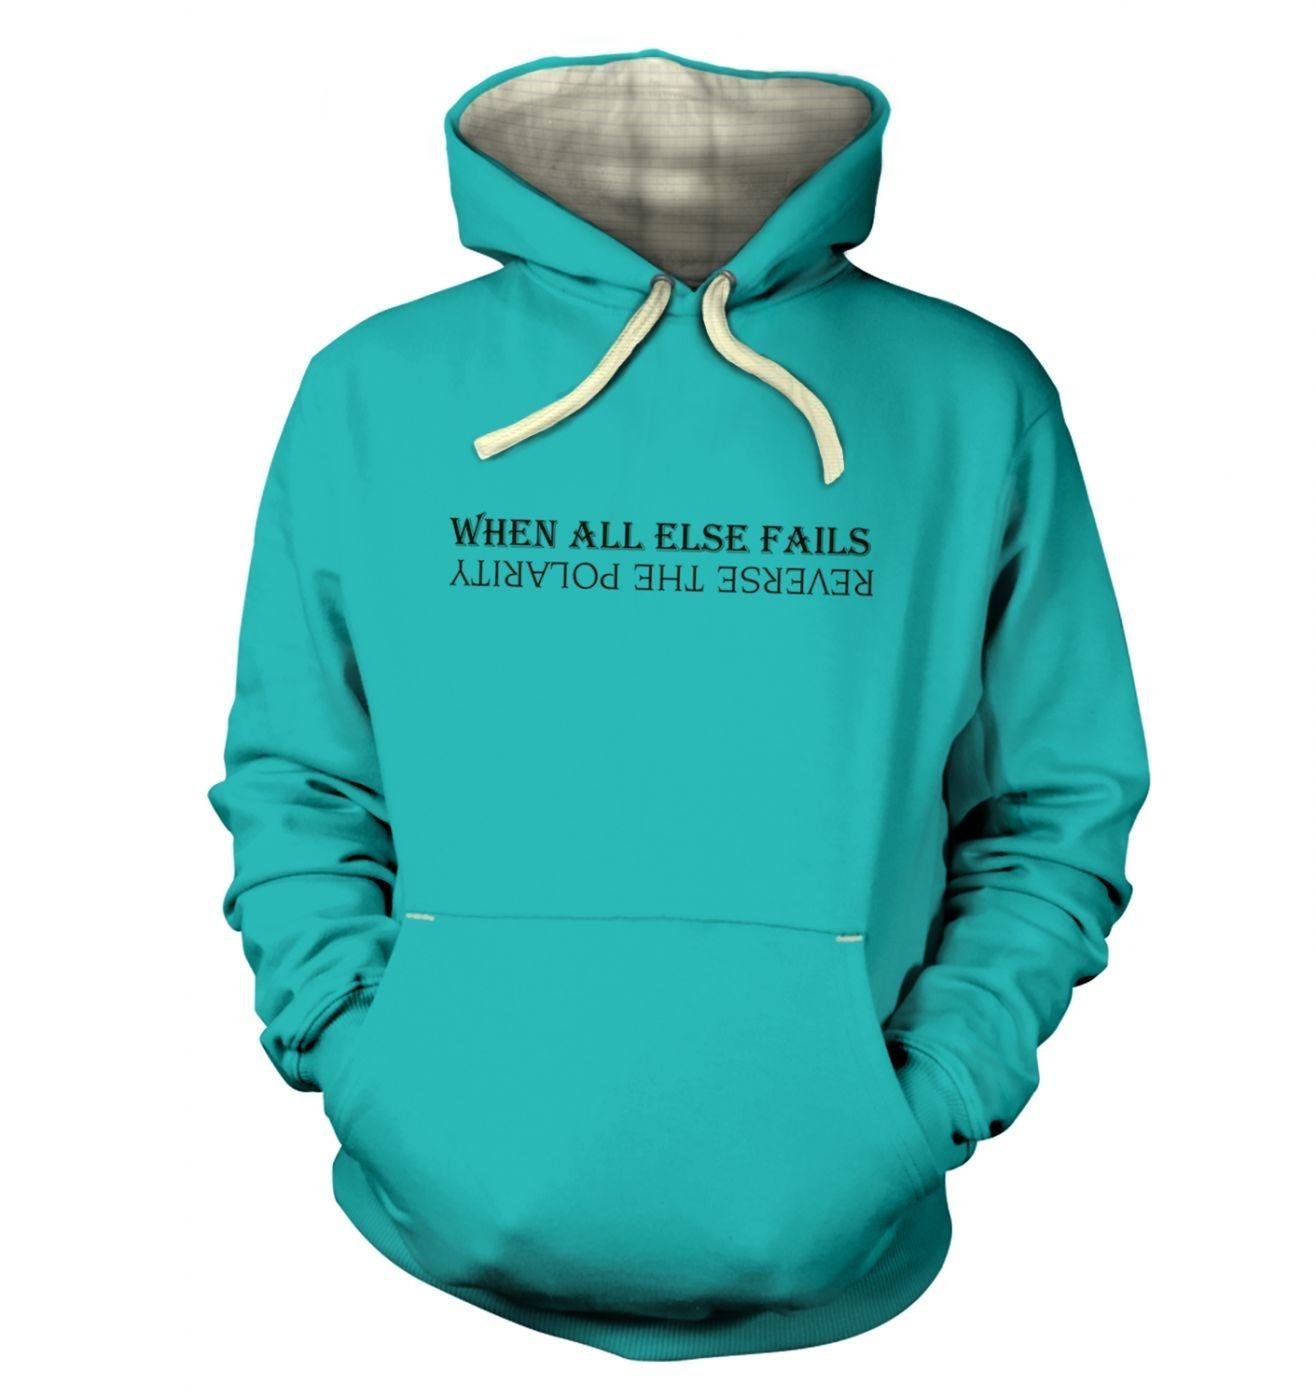 Reverse The Polarity hoodie (premium)